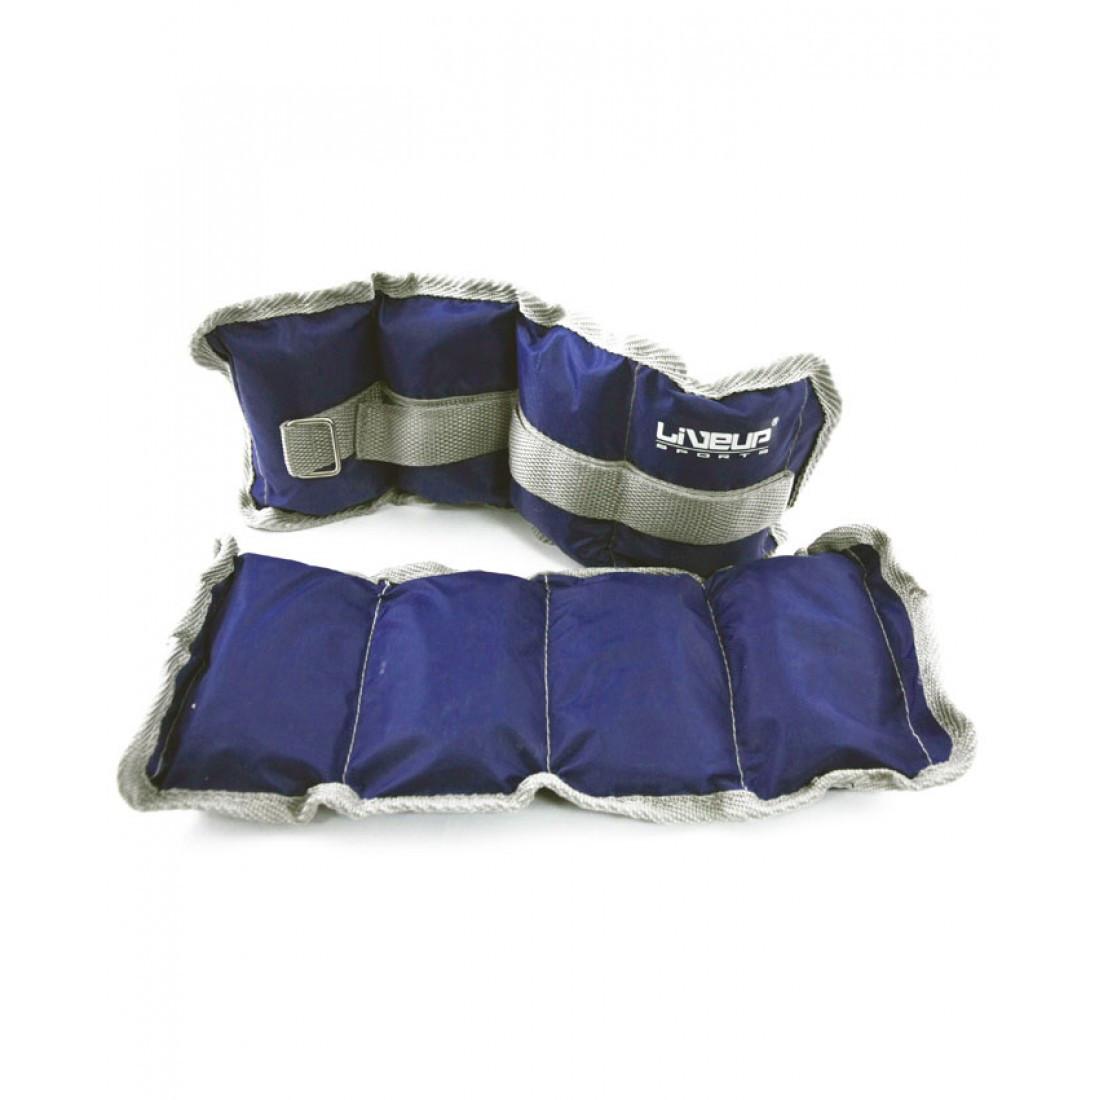 Утяжелители-манжеты для рук и ног LiveUp Wrist/Ankle Weight 2шт х 1 кг